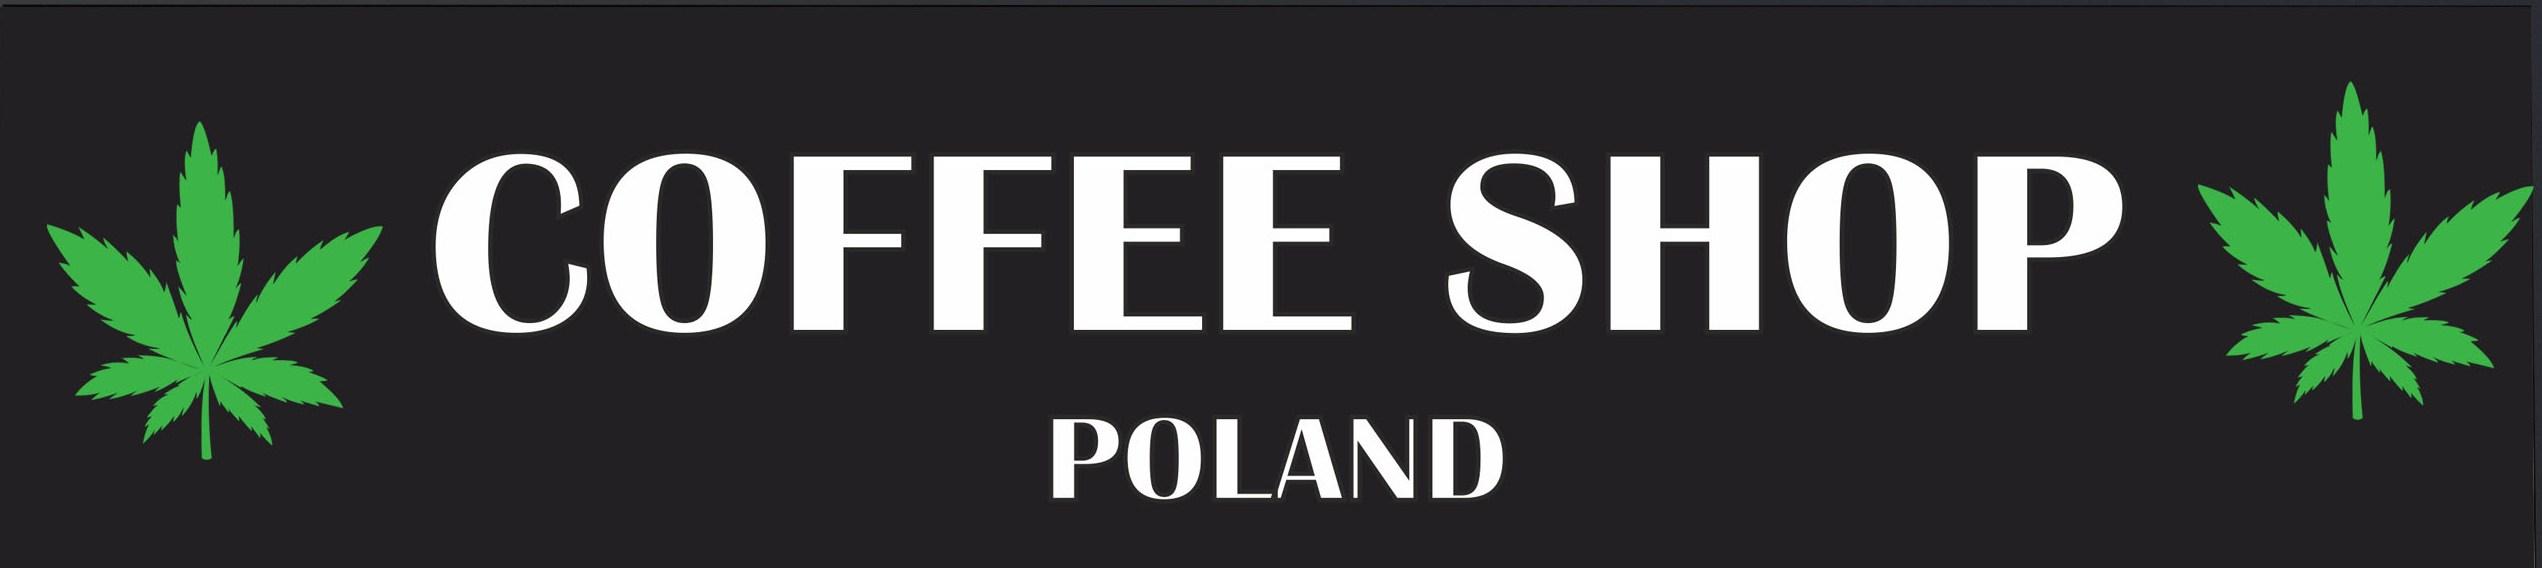 Coffee Shop Poland